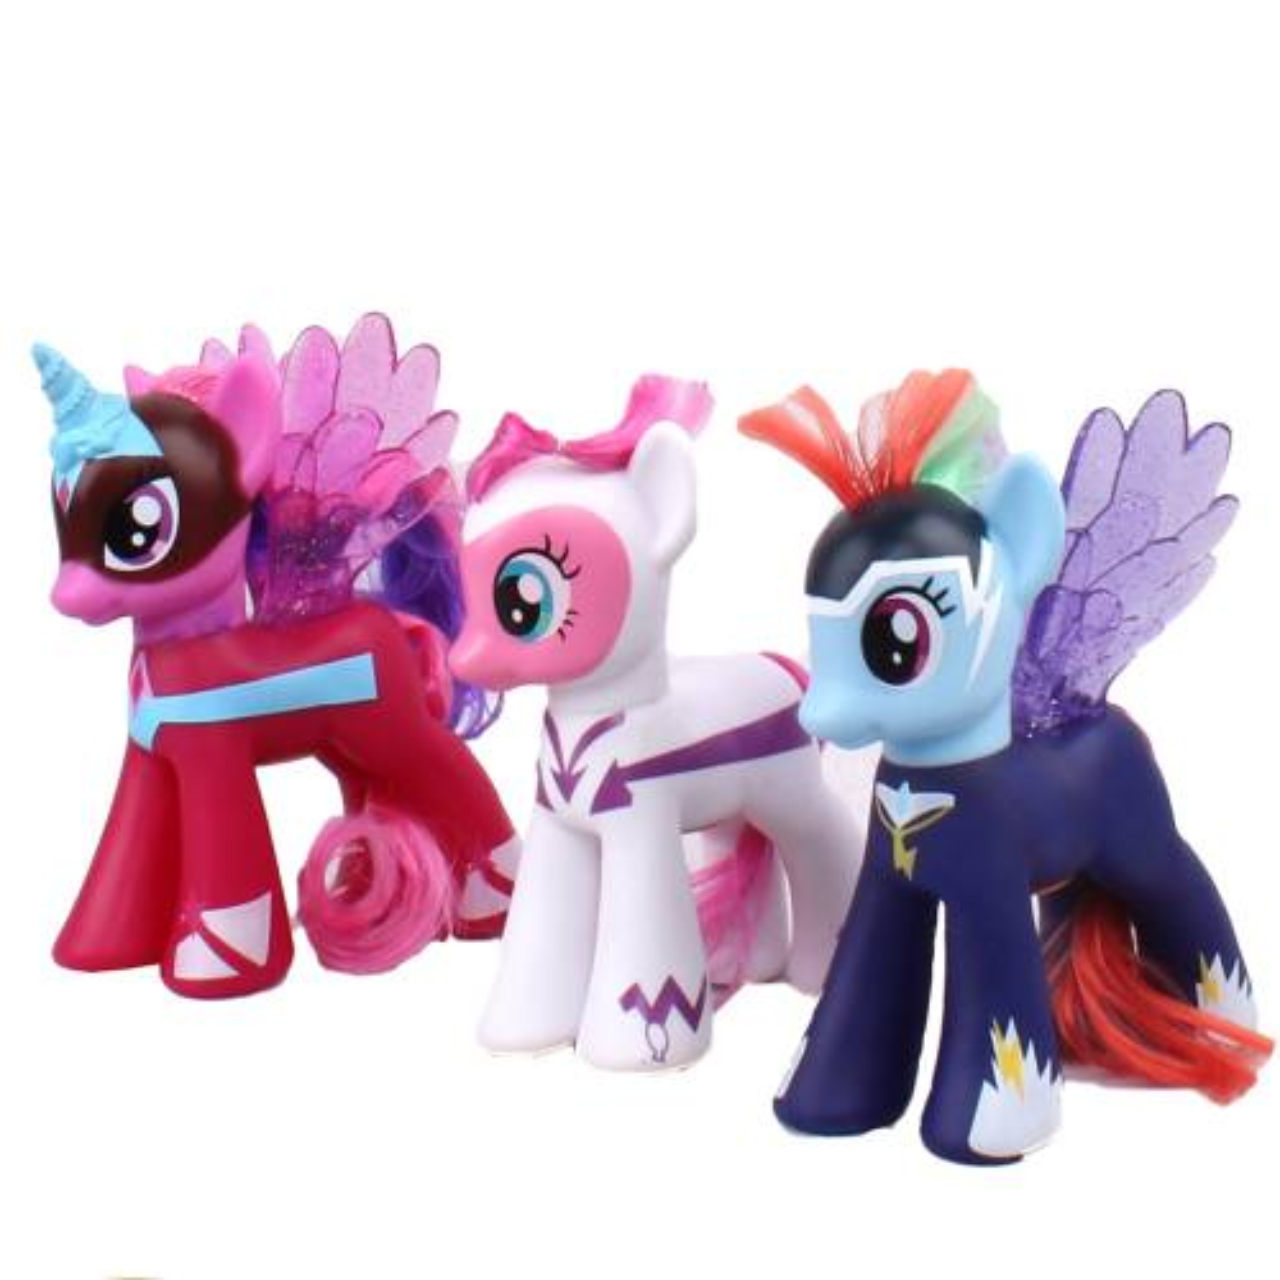 عروسک پونی مدل Super Horse بسته سه عددی